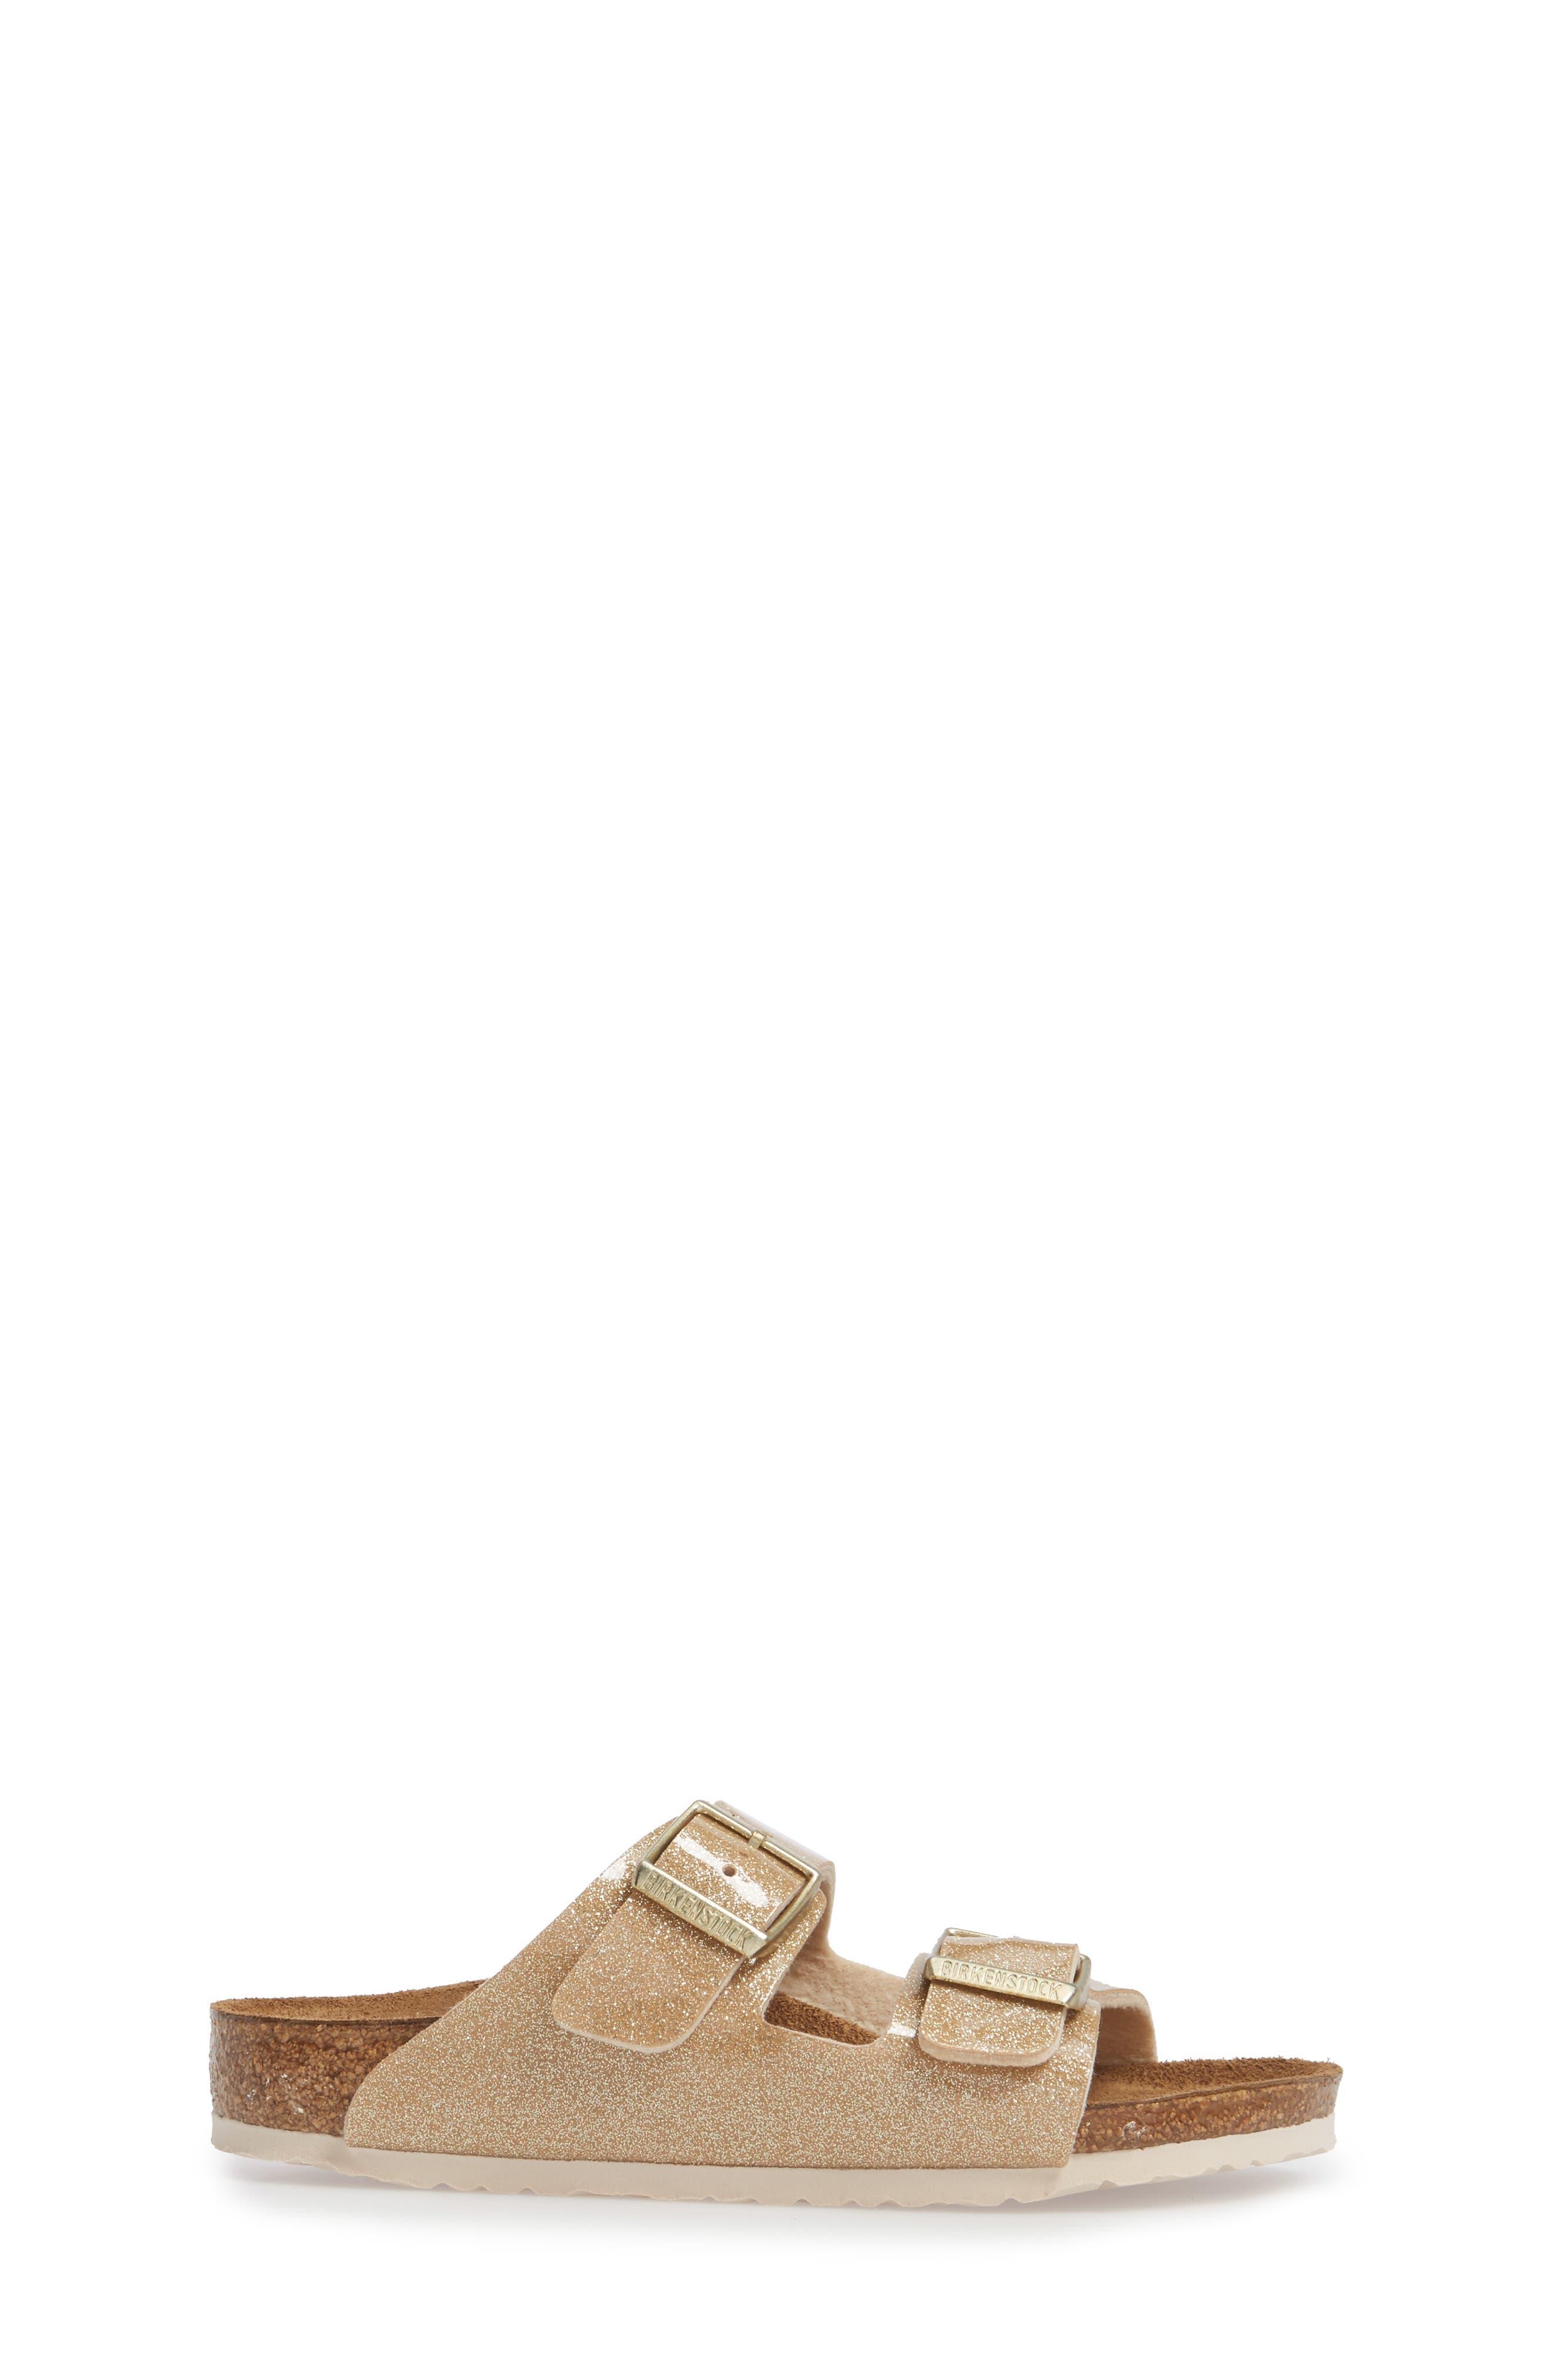 'Arizona Galaxy Birko-Flor' Slide Sandal,                             Alternate thumbnail 9, color,